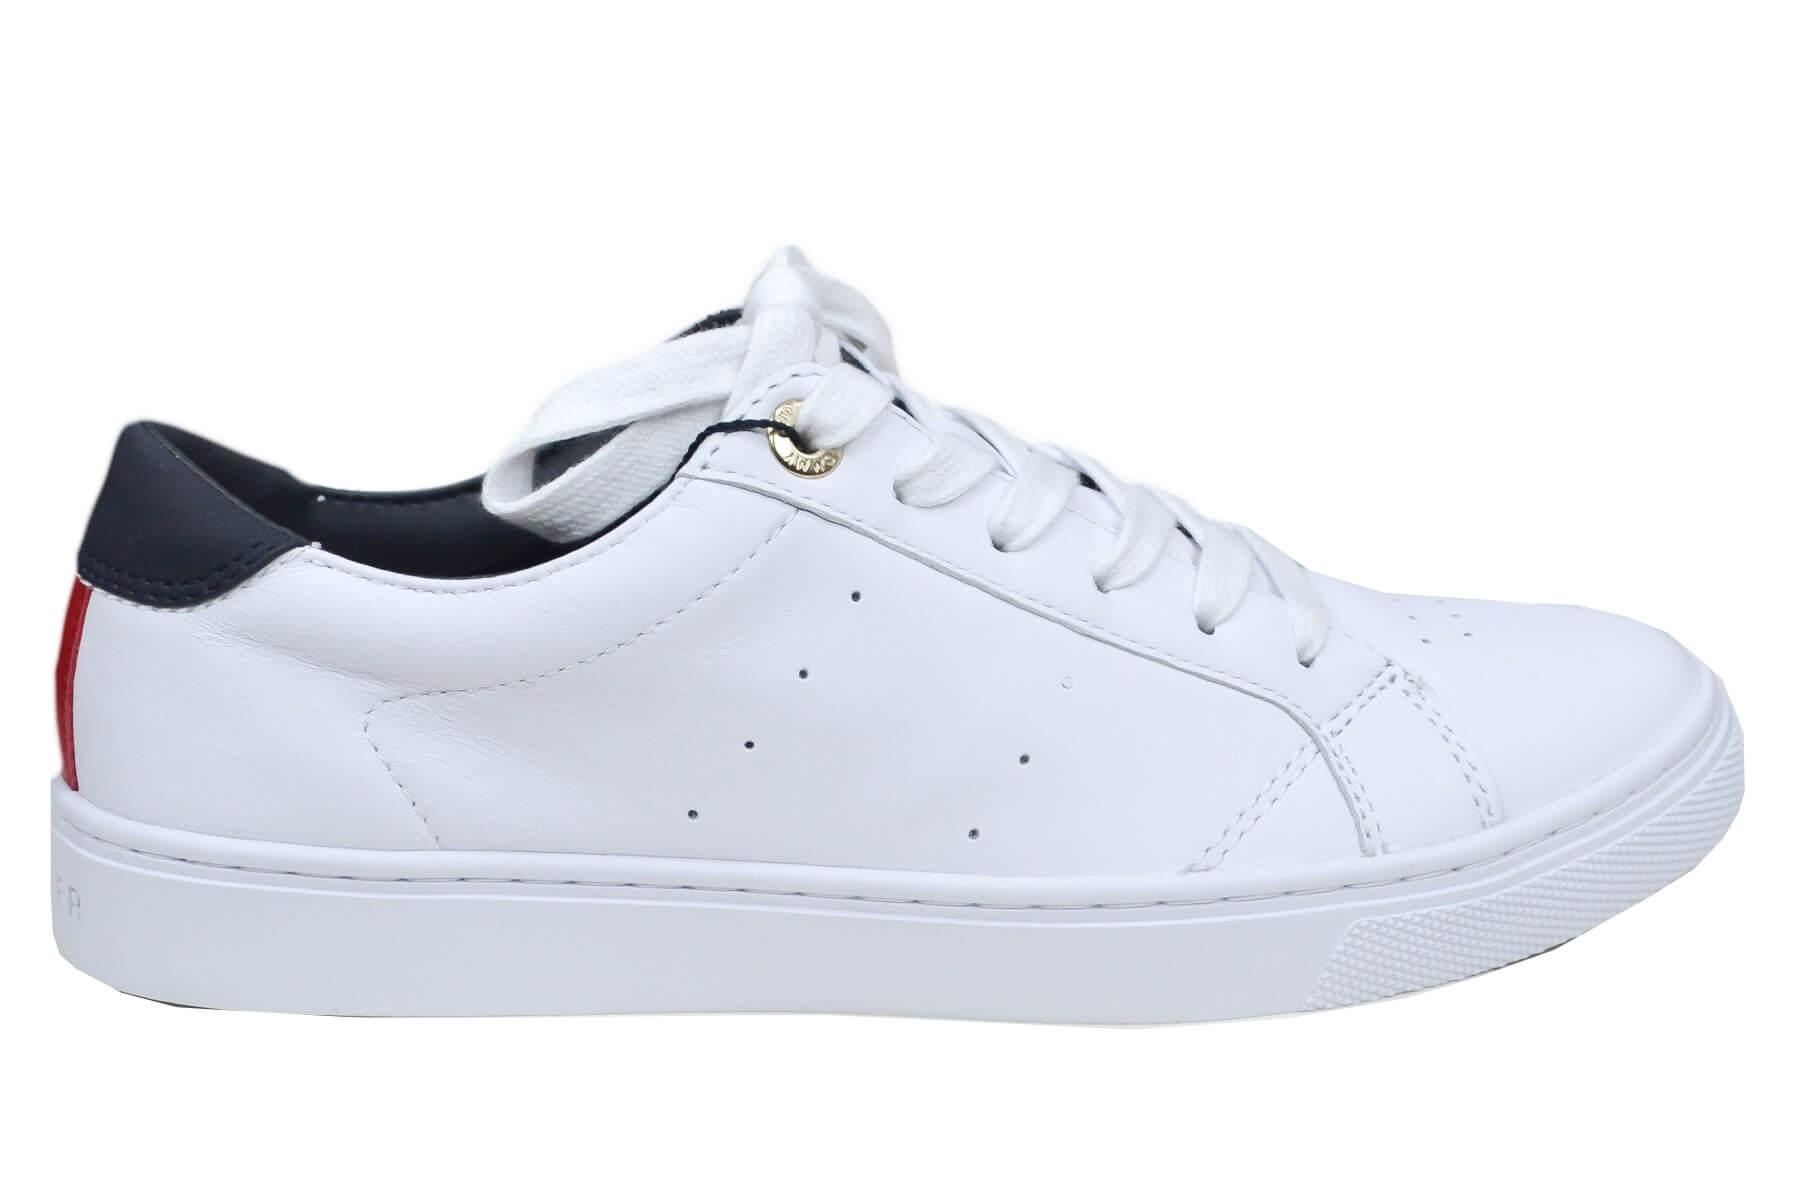 530ecda393db chaussure tommy hilfiger femme blanche